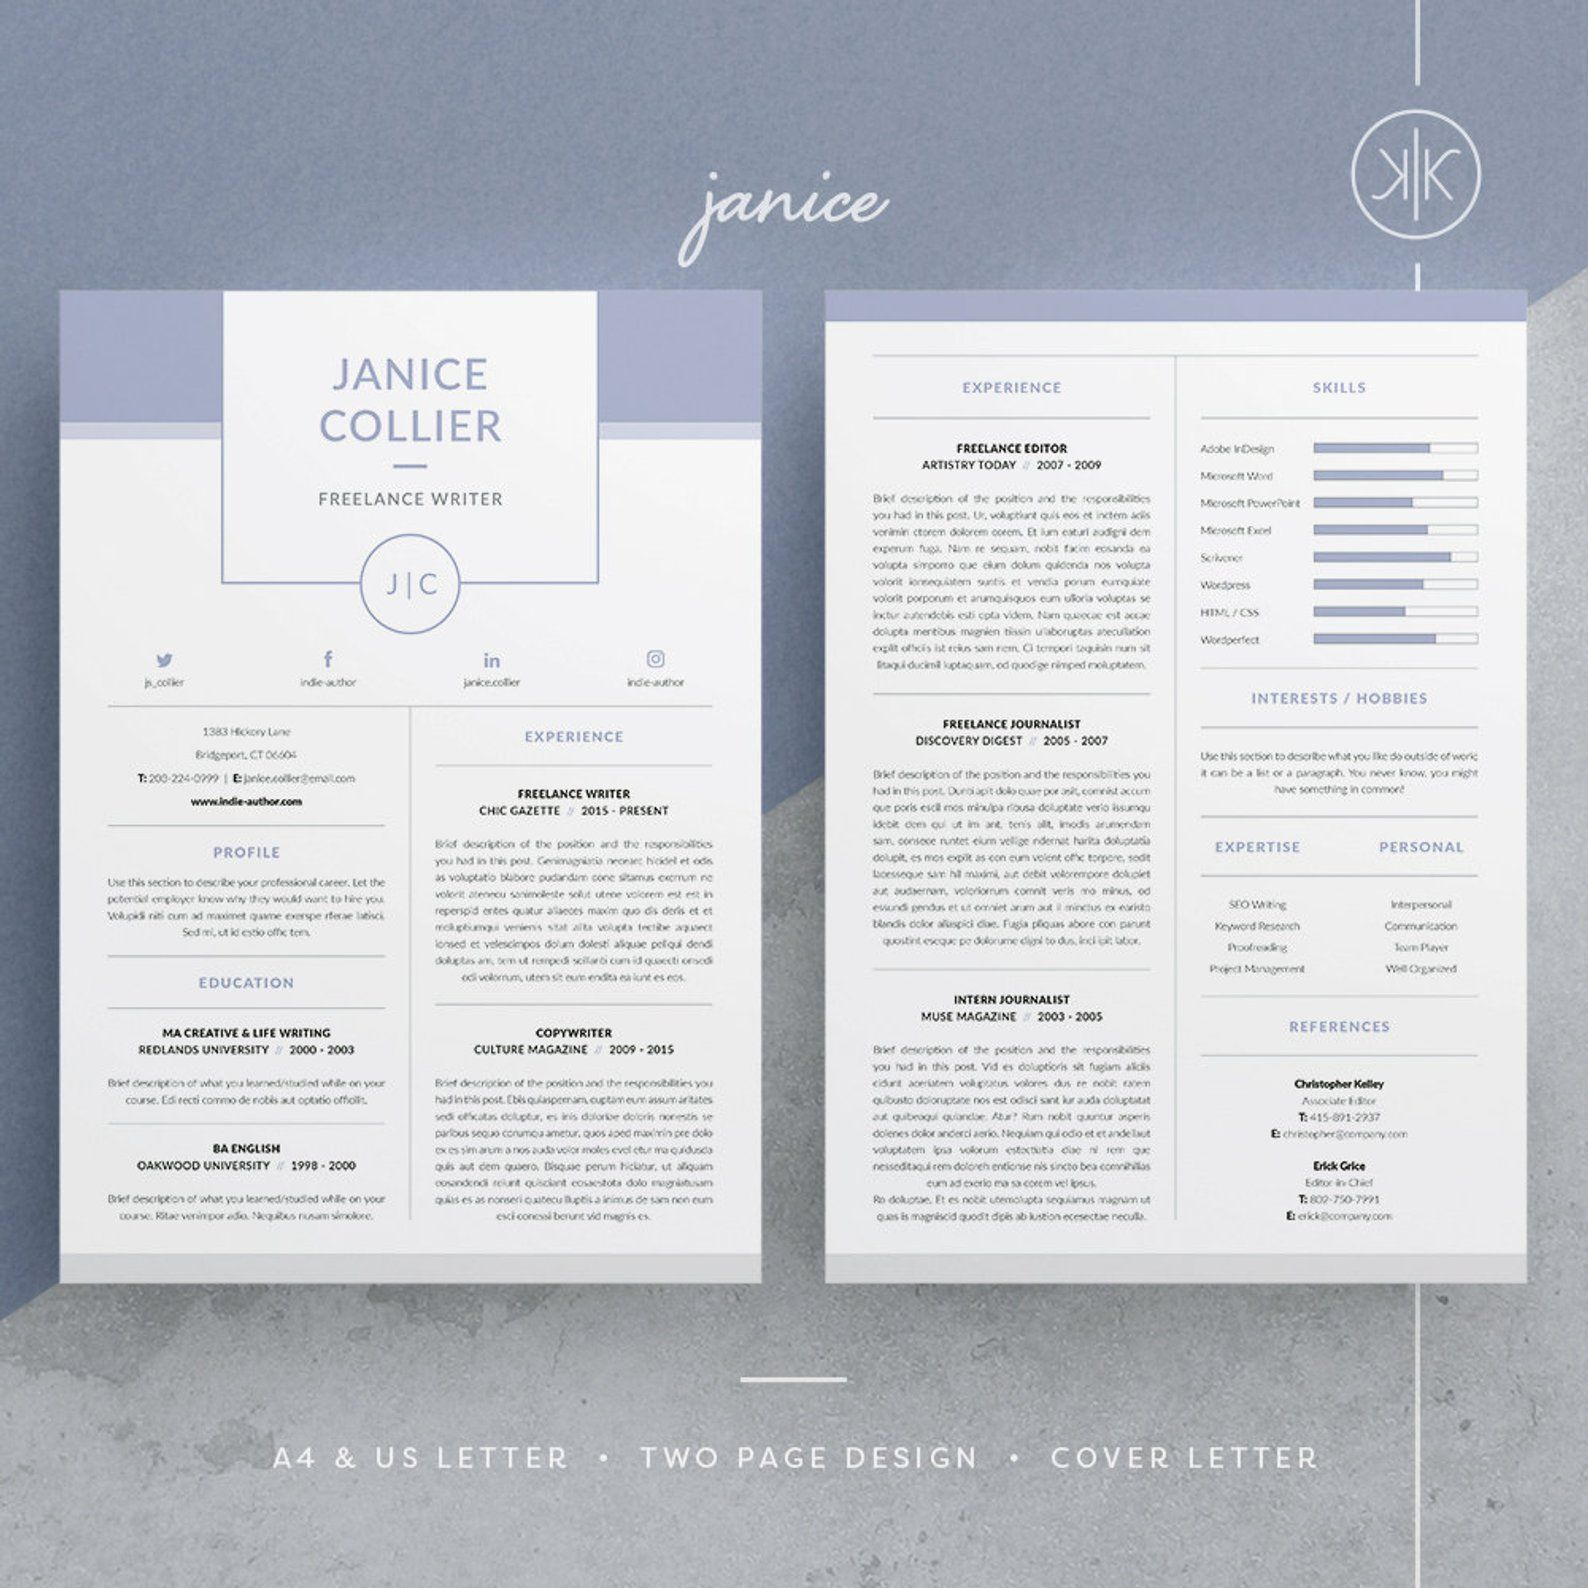 Janice Resume/CV Template Word InDesign